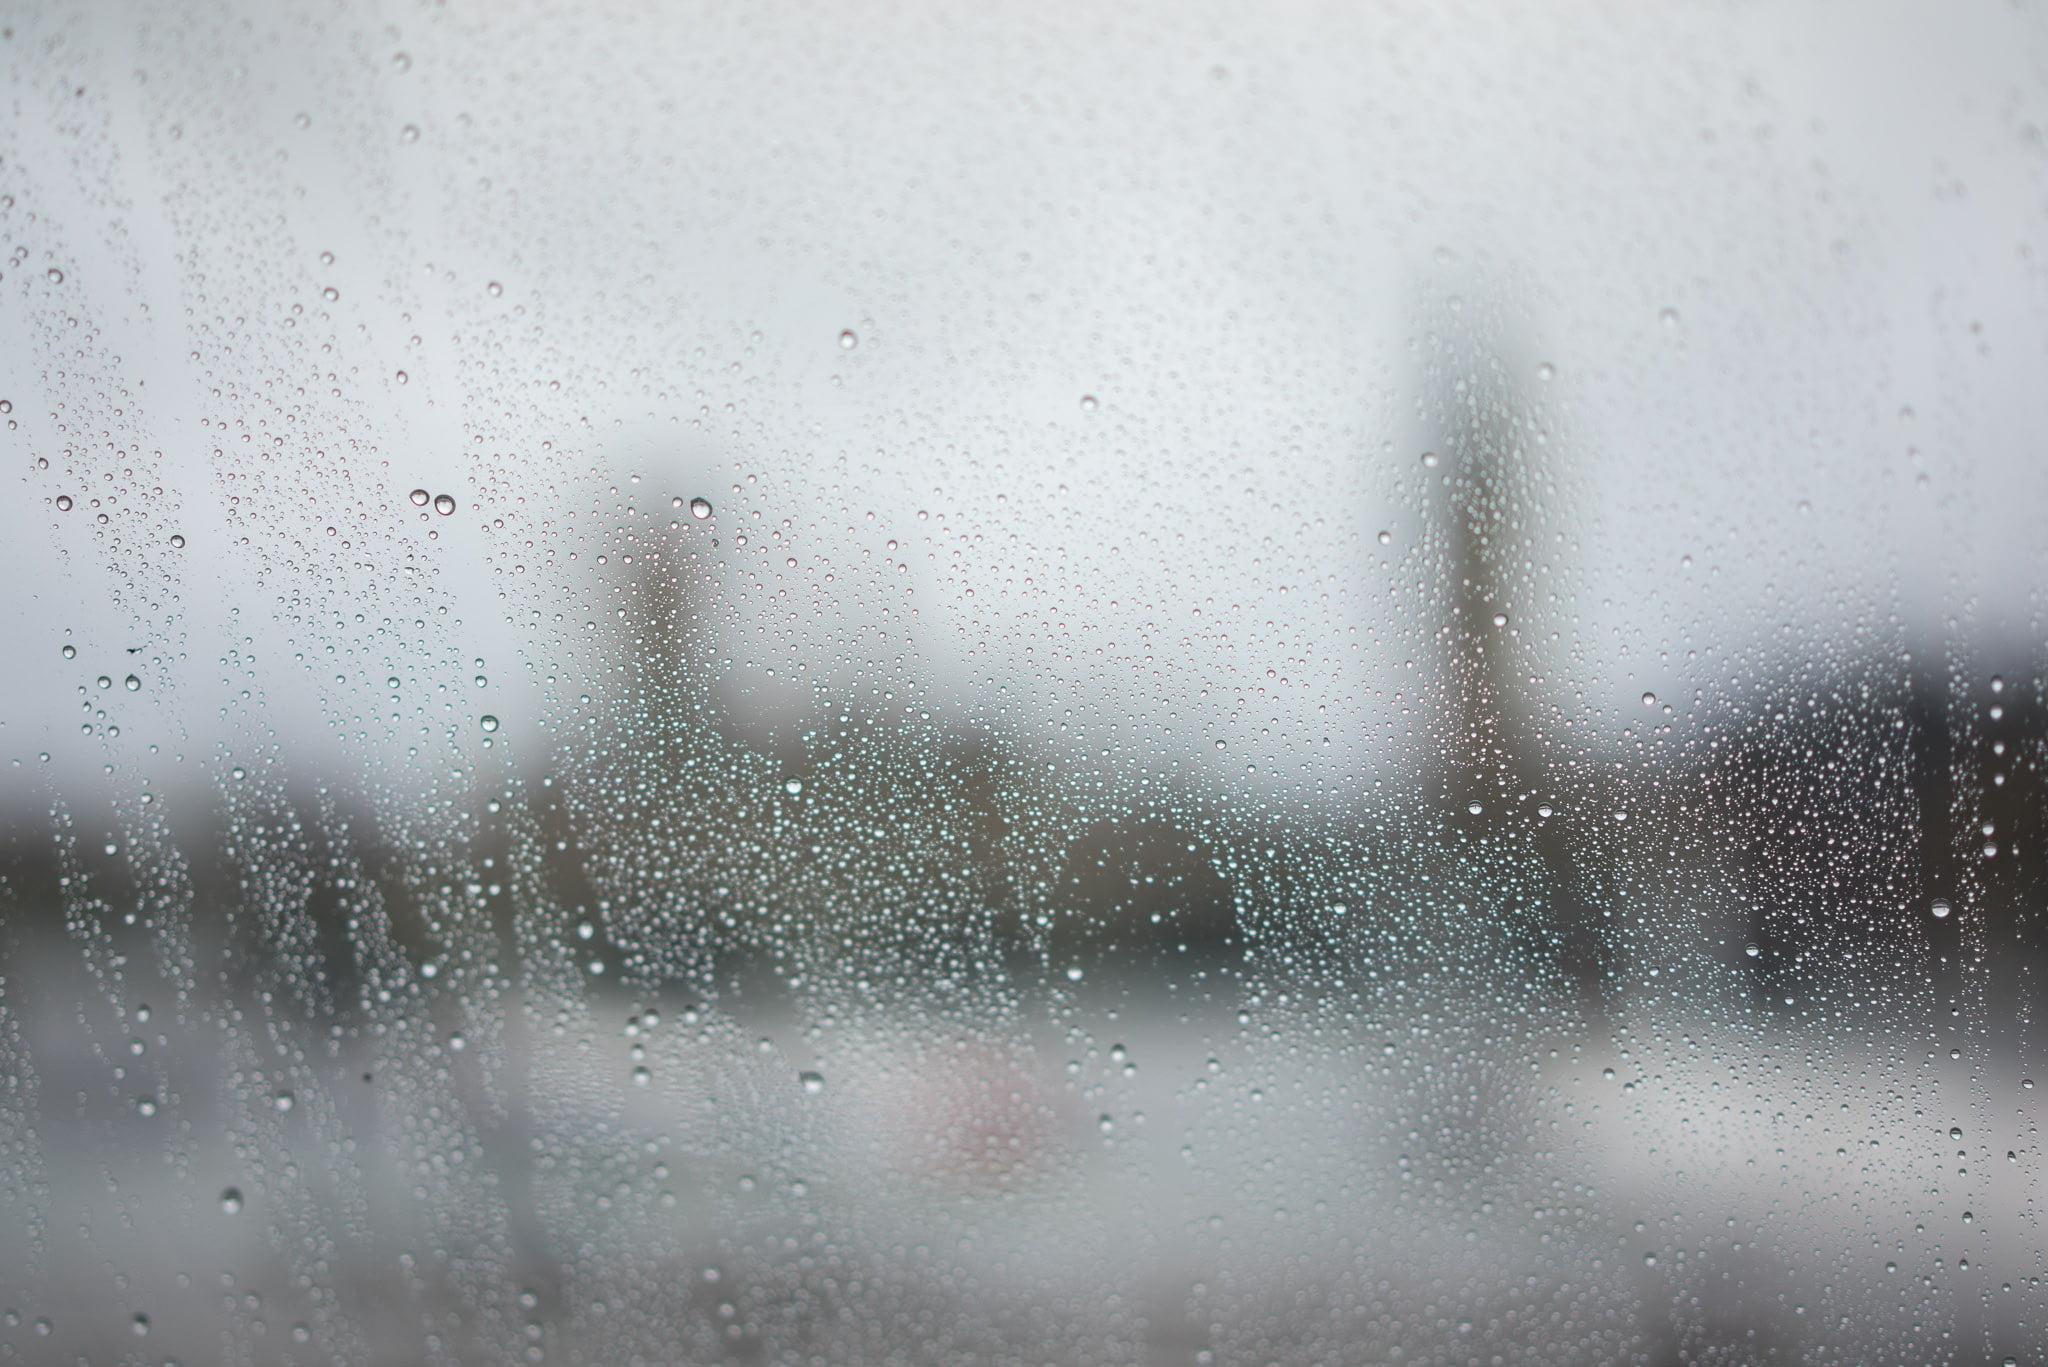 BIG RAIN Spring time in London